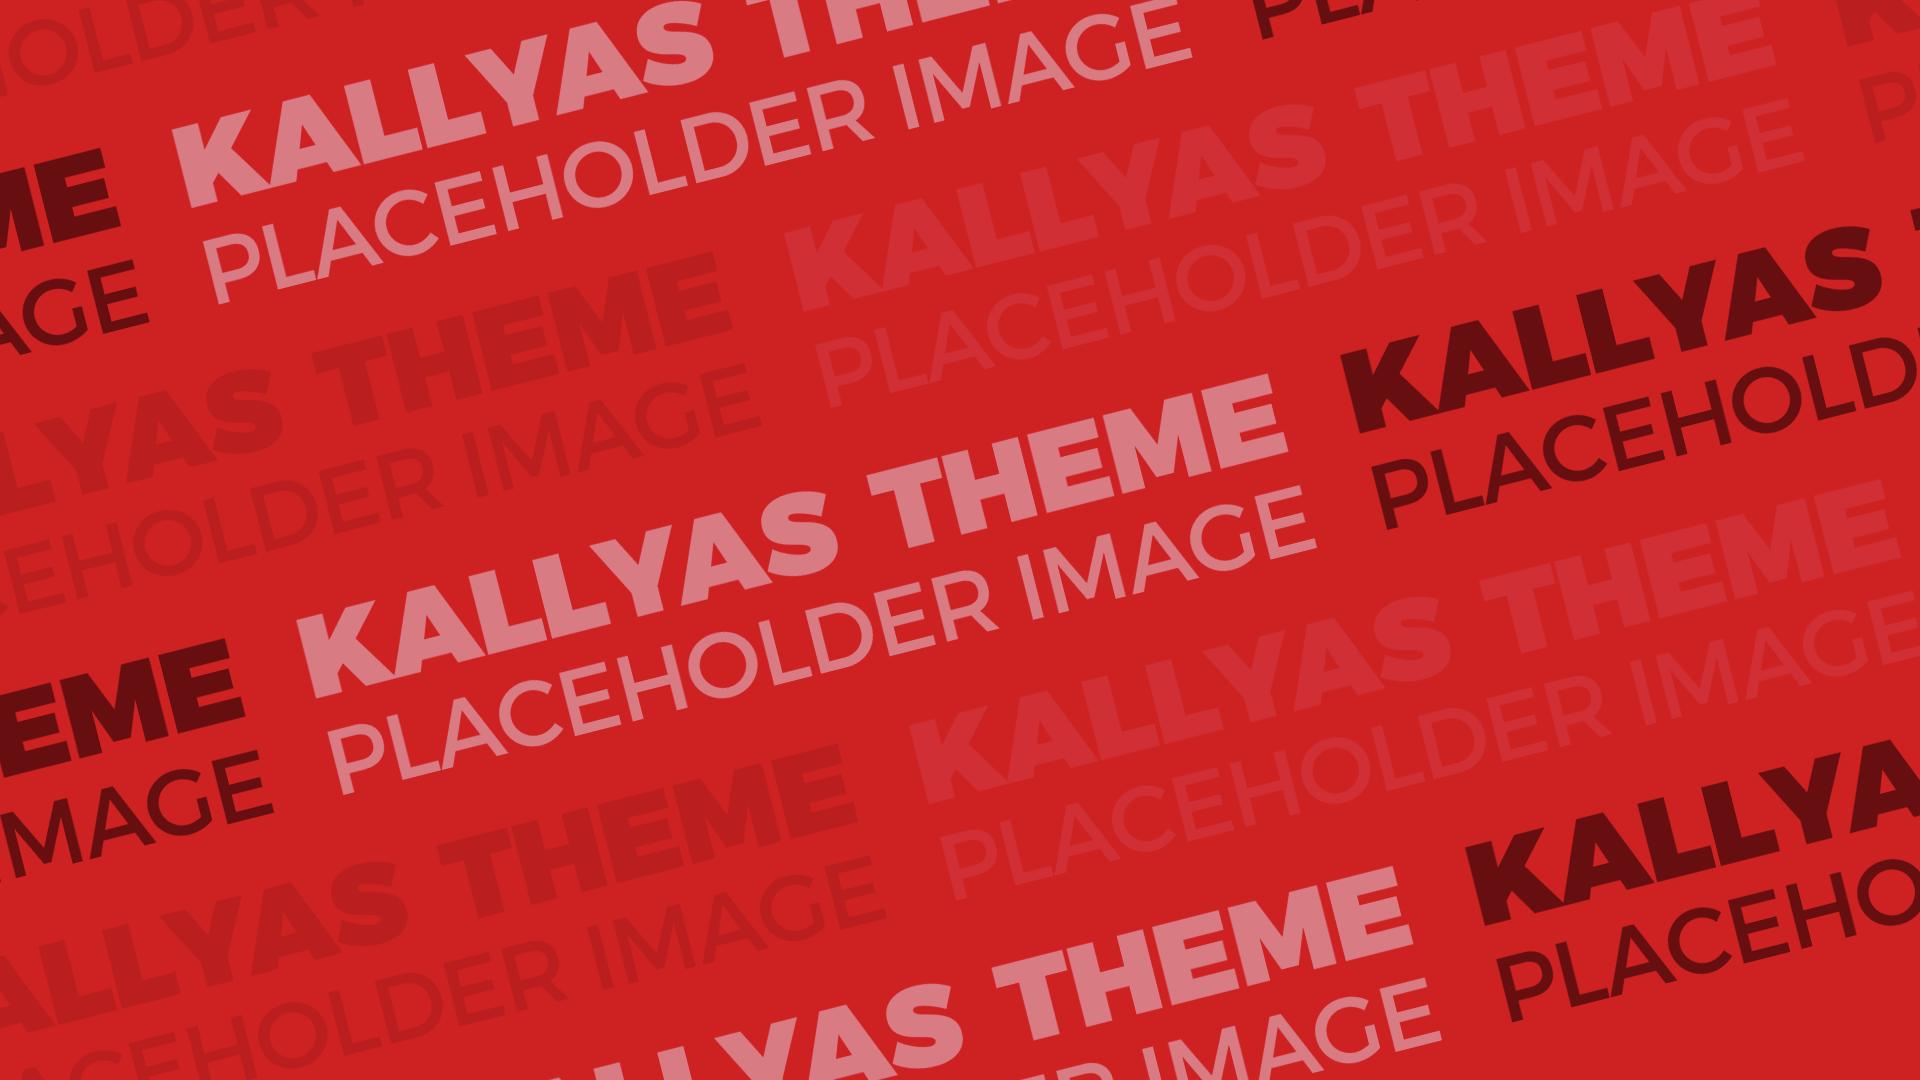 kallyas_sample.png